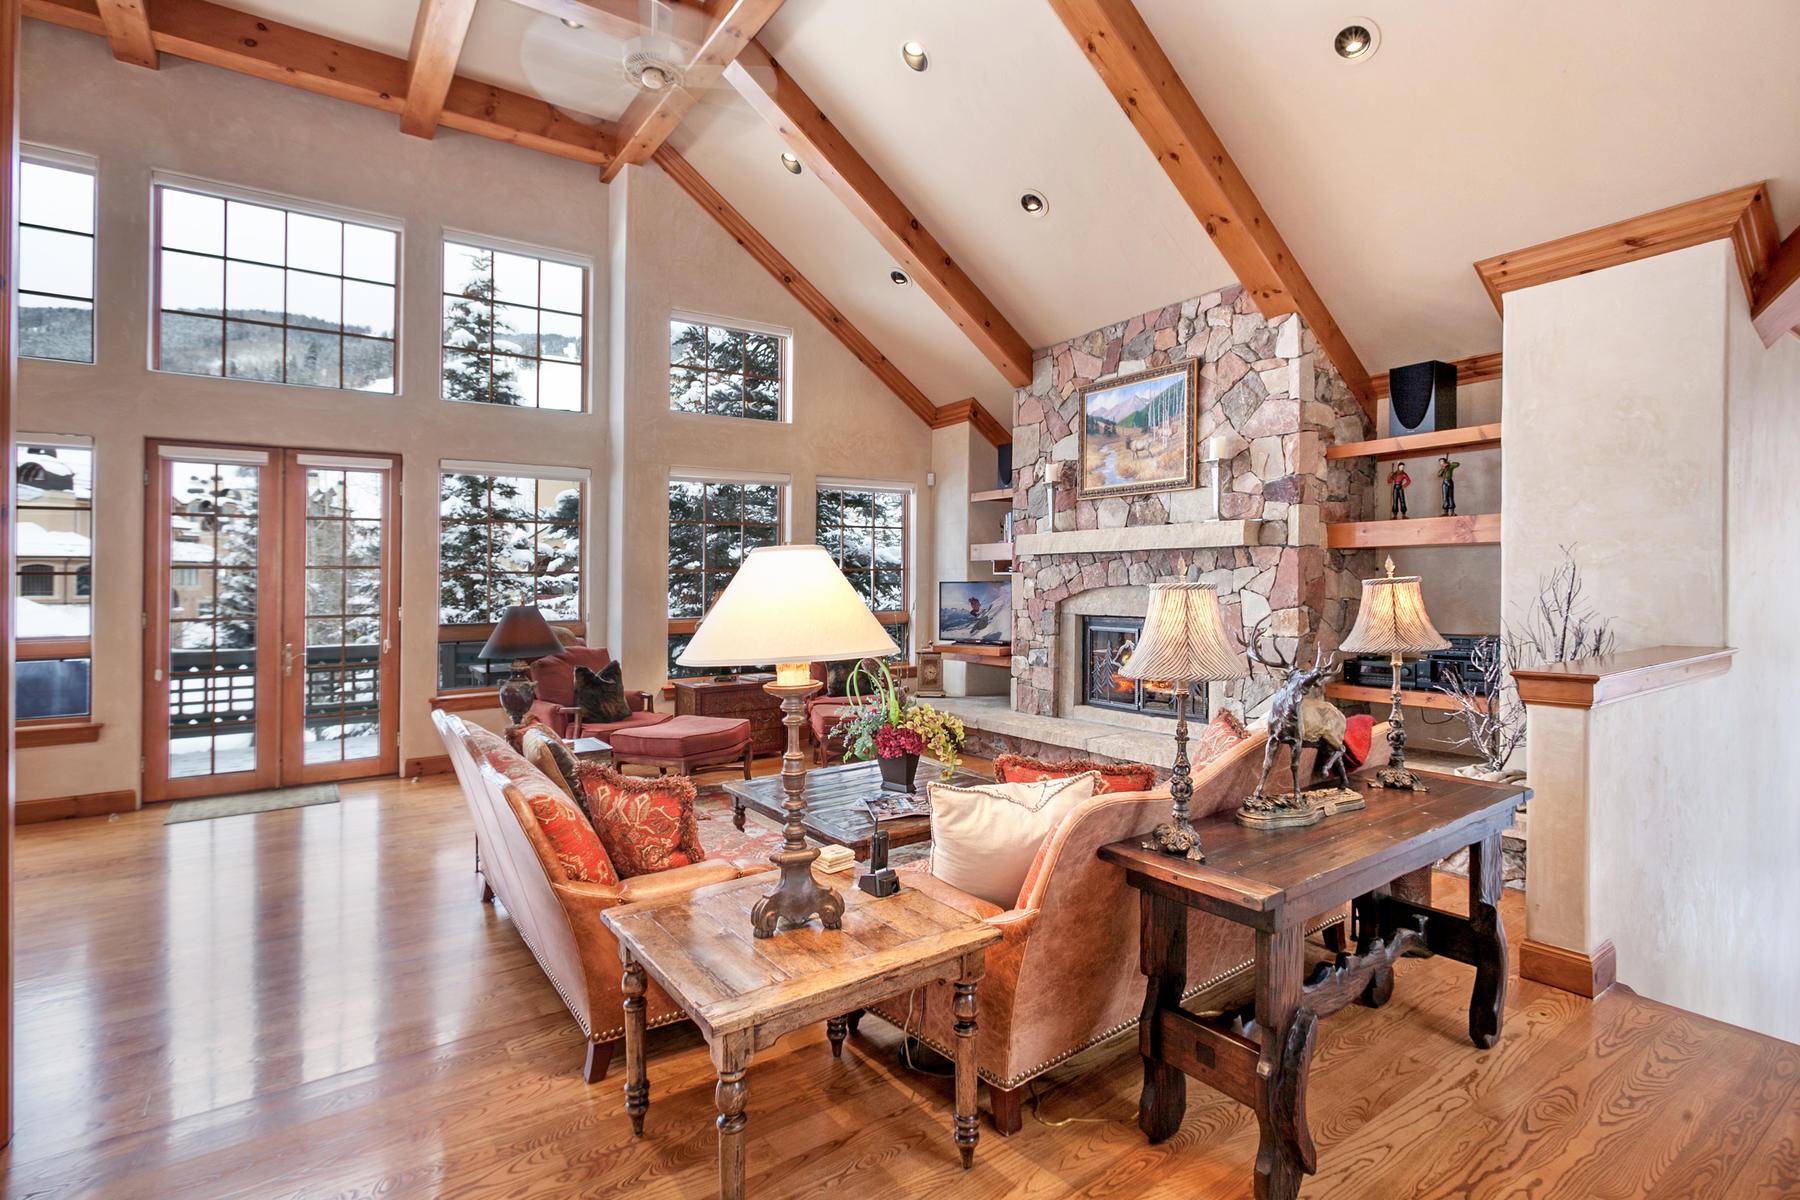 Villetta a schiera per Vendita alle ore Pinehurst Residence 3 45 Red Spruce Lane Beaver Creek, Beaver Creek, Colorado, 81620 Stati Uniti